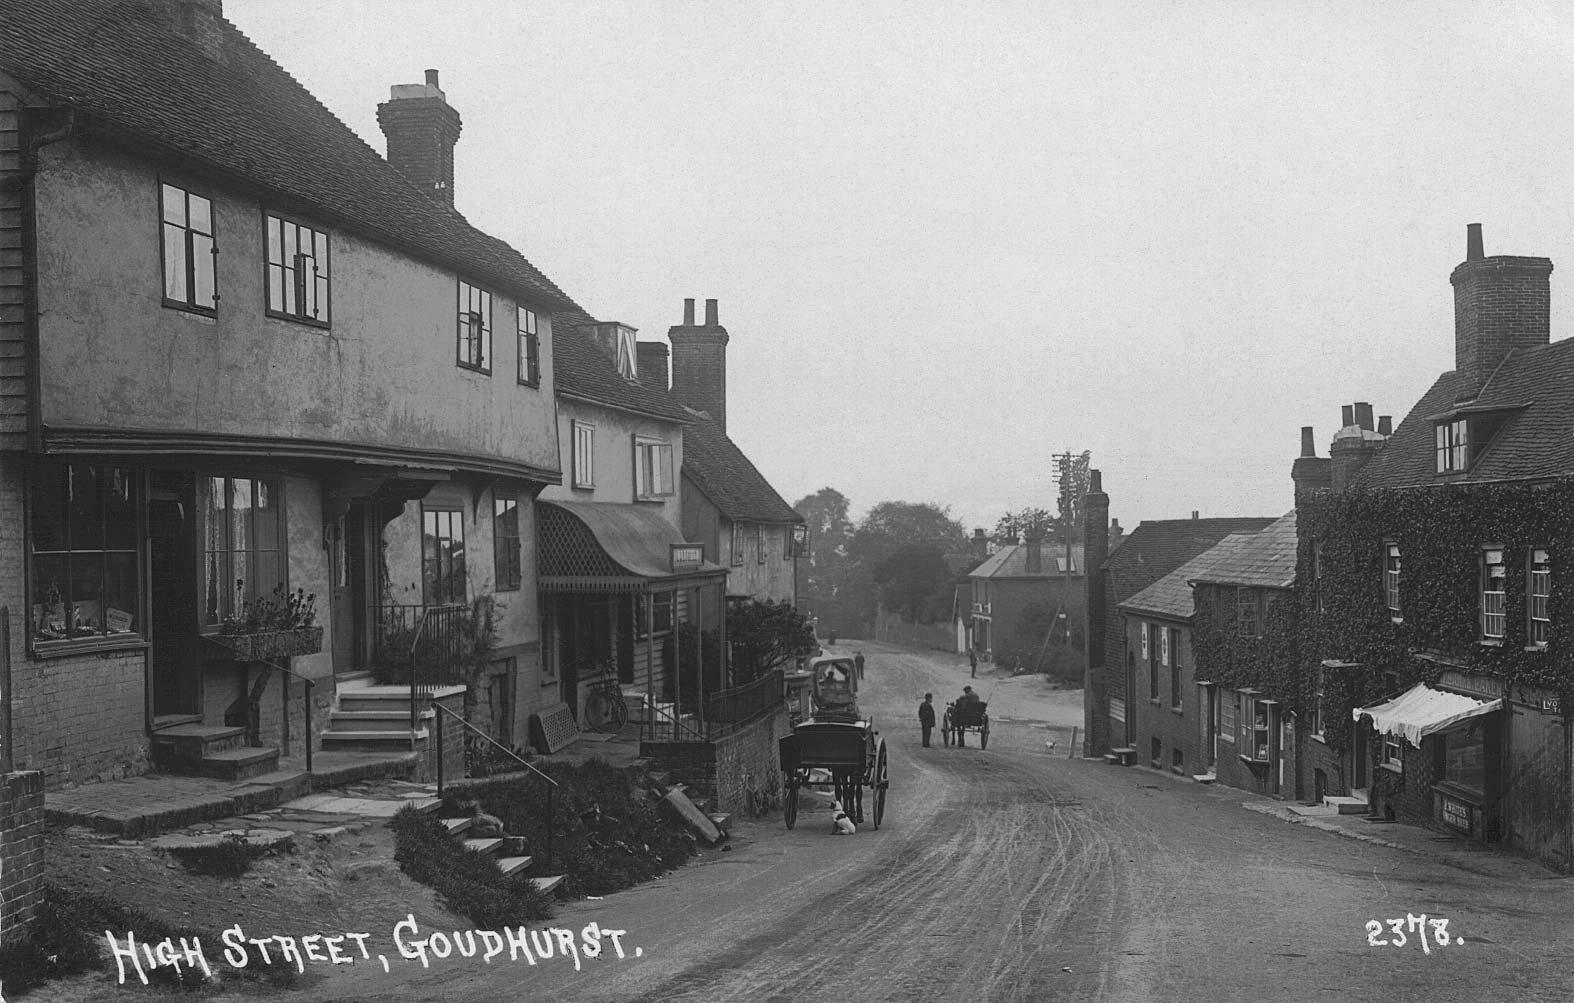 High Street, Goudhurst pre-1914